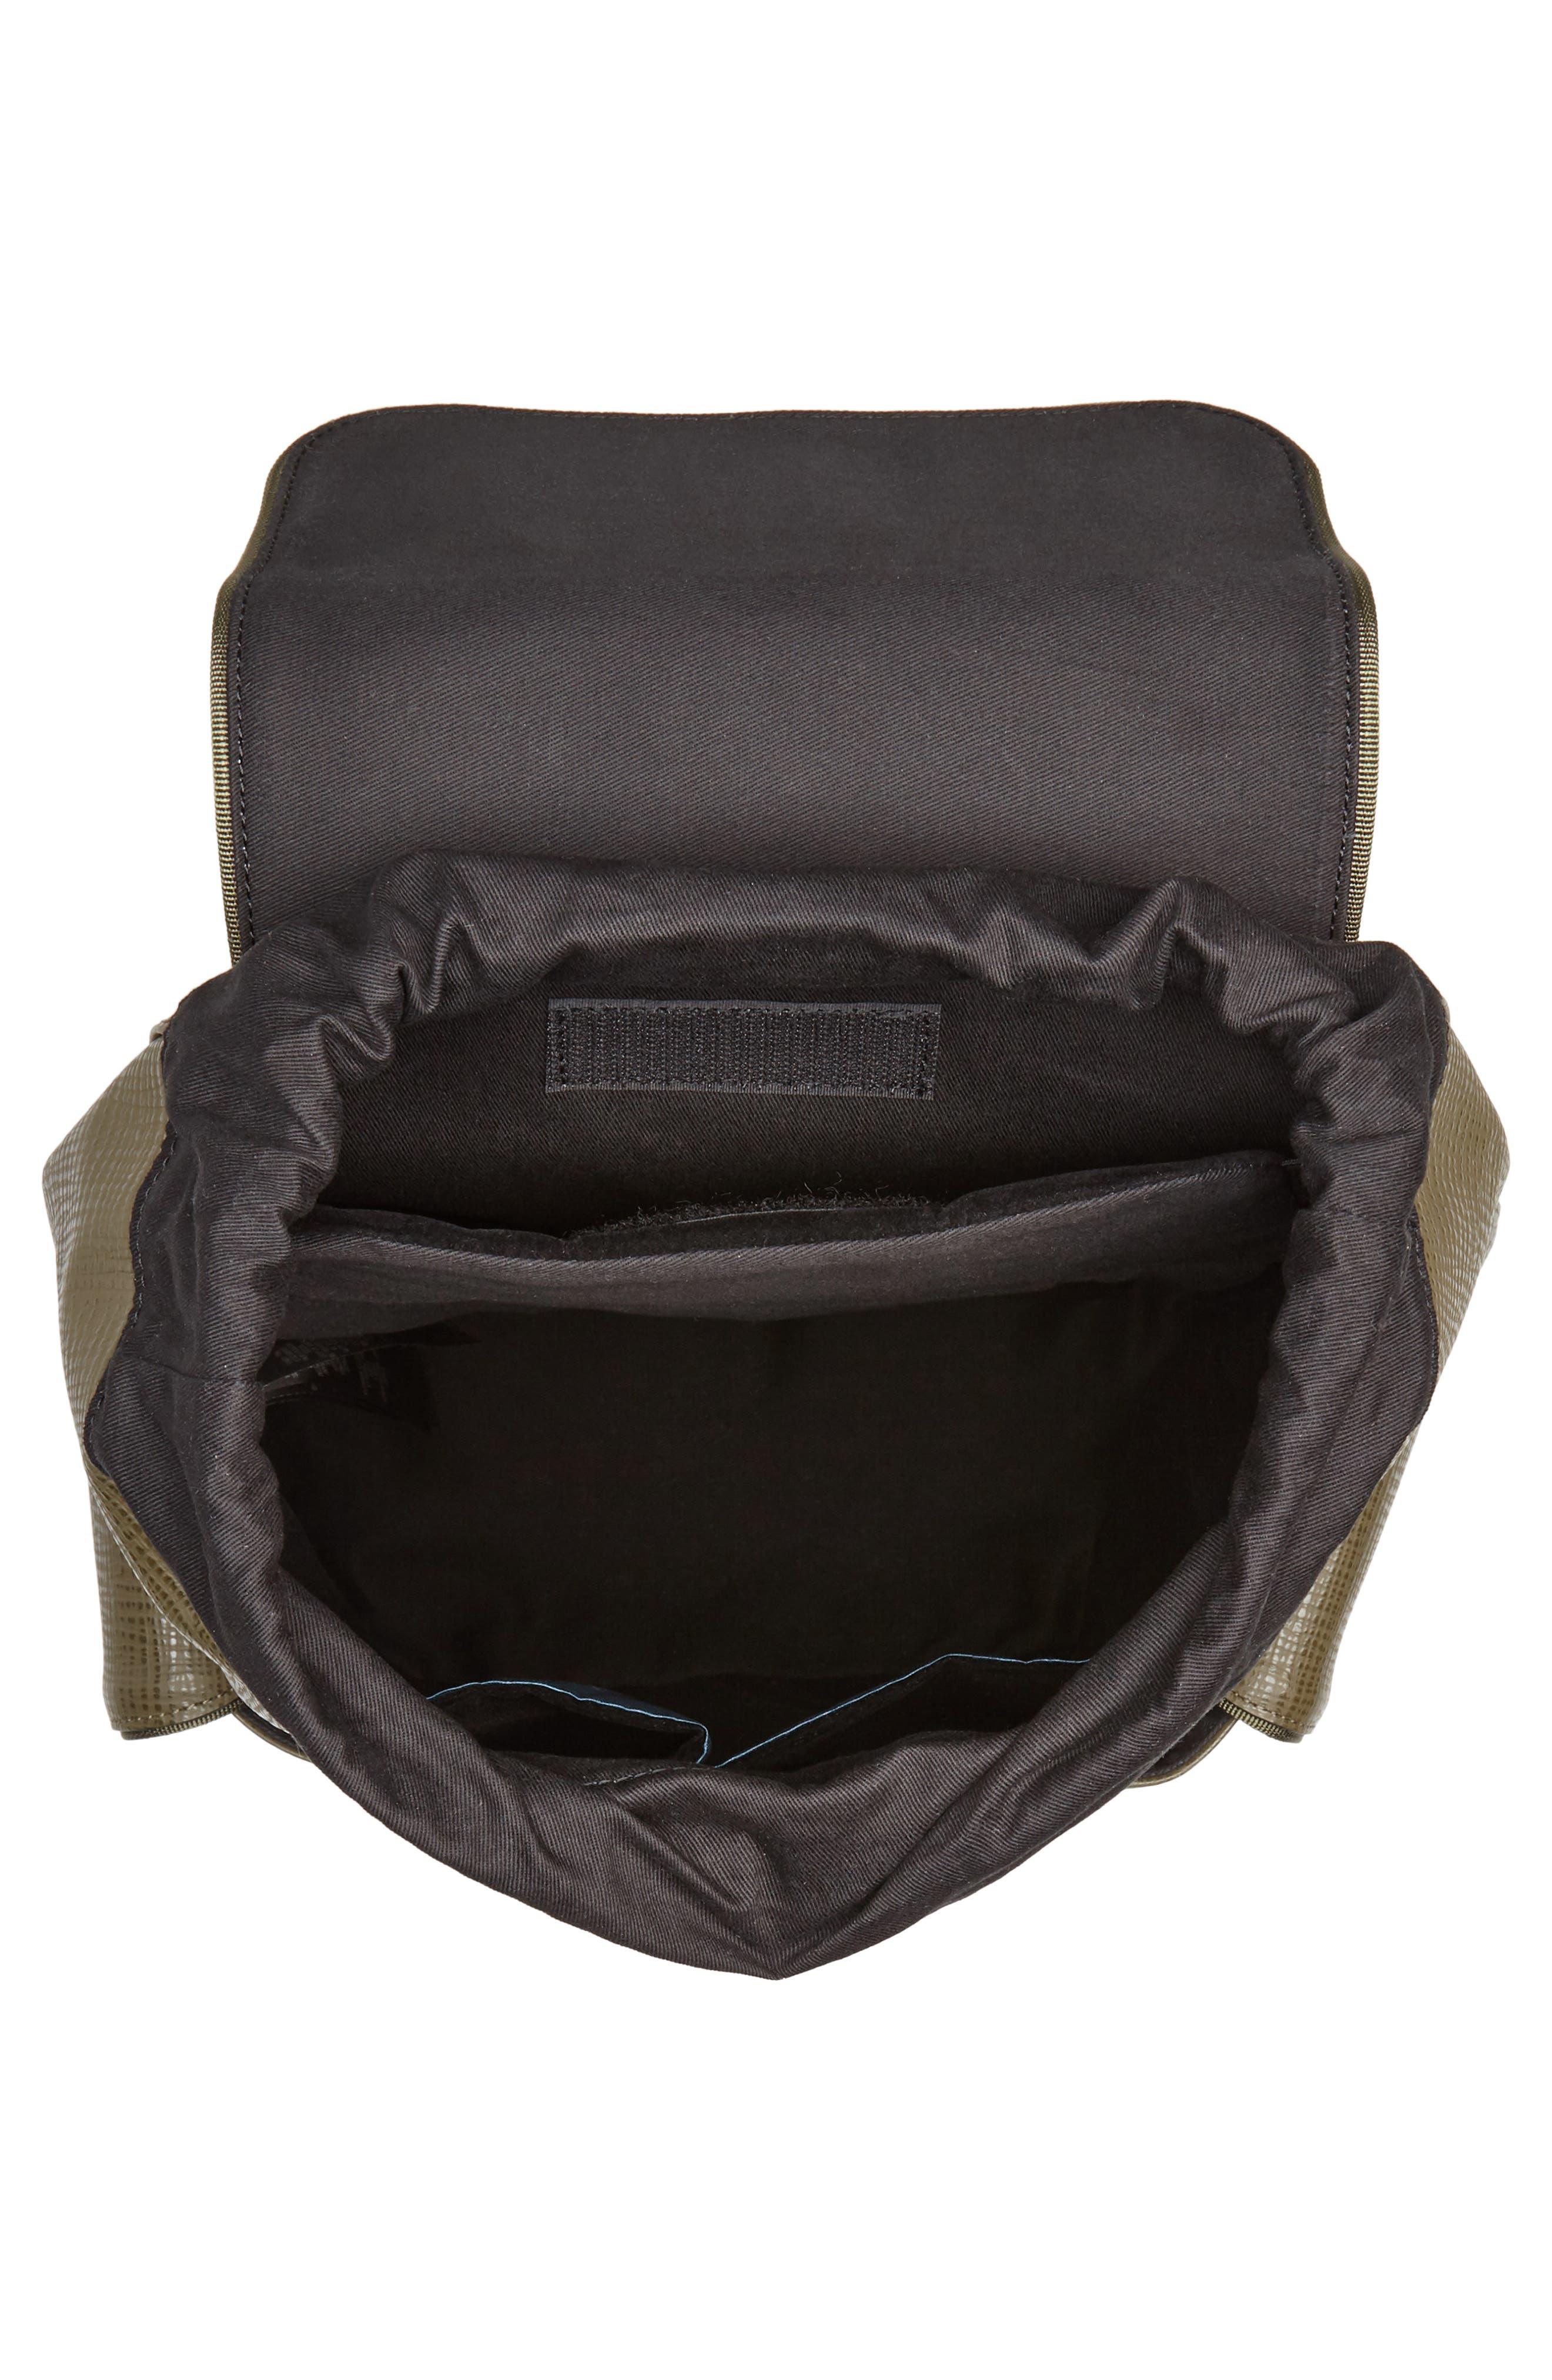 Thorr Palmelato Backpack,                             Alternate thumbnail 4, color,                             Olive